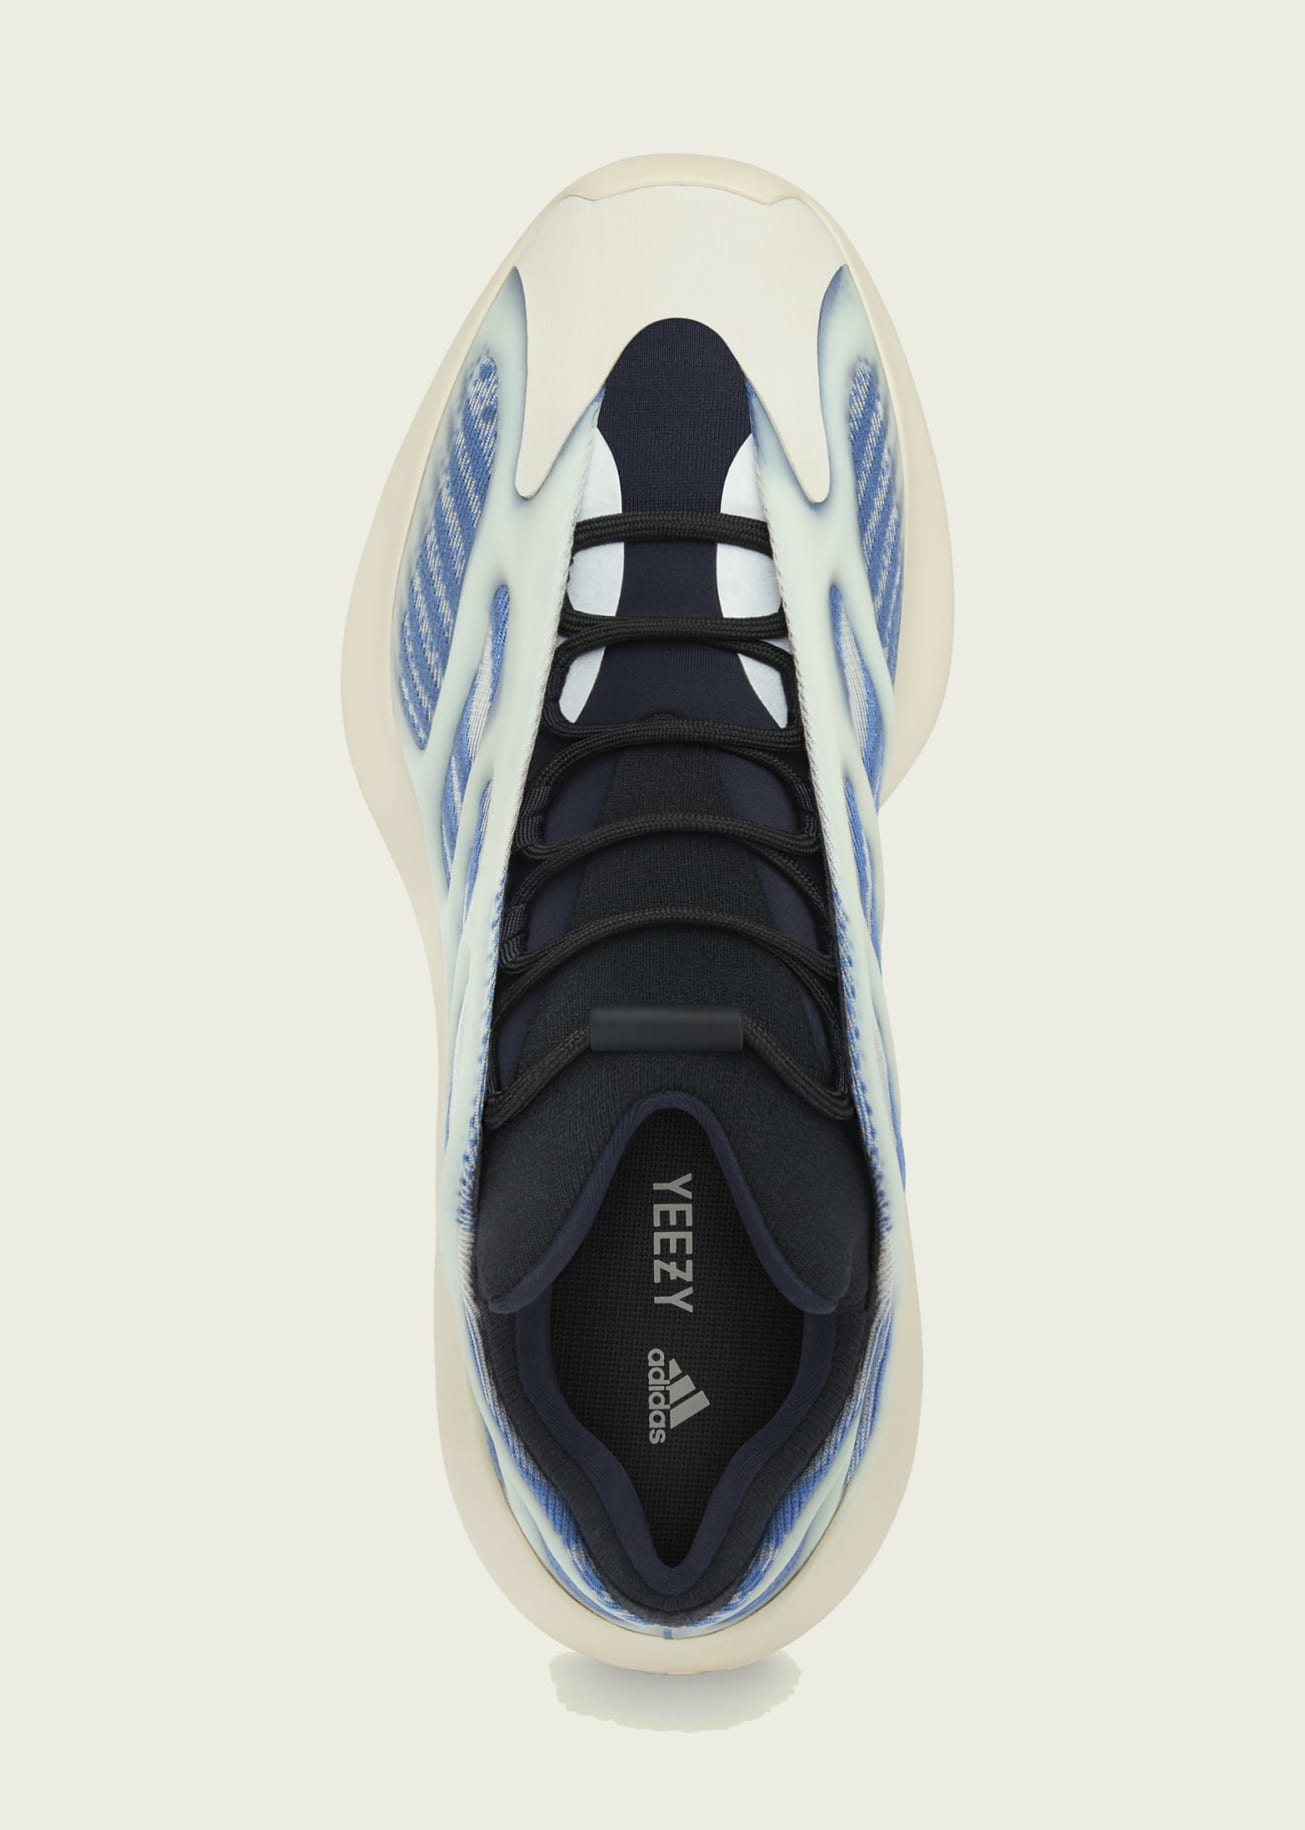 Adidas Yeezy 700 V3 'Kyanite' GY0260 Top